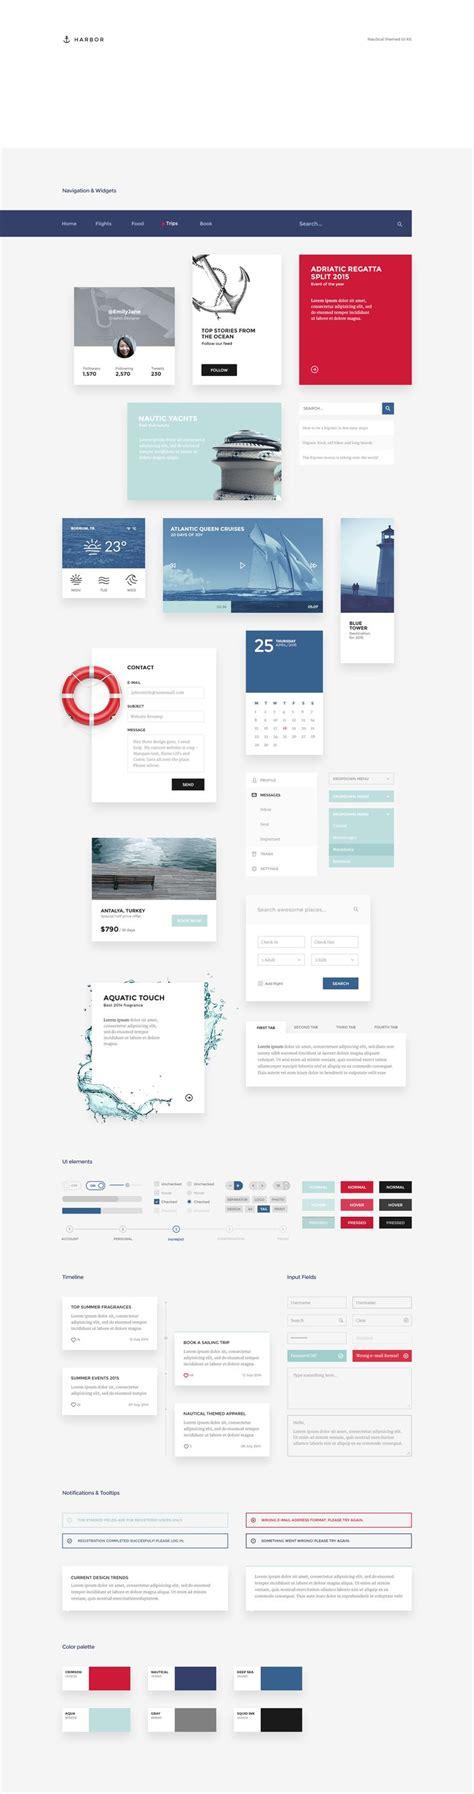 ui design proposal 25 best ideas about form design on pinterest report